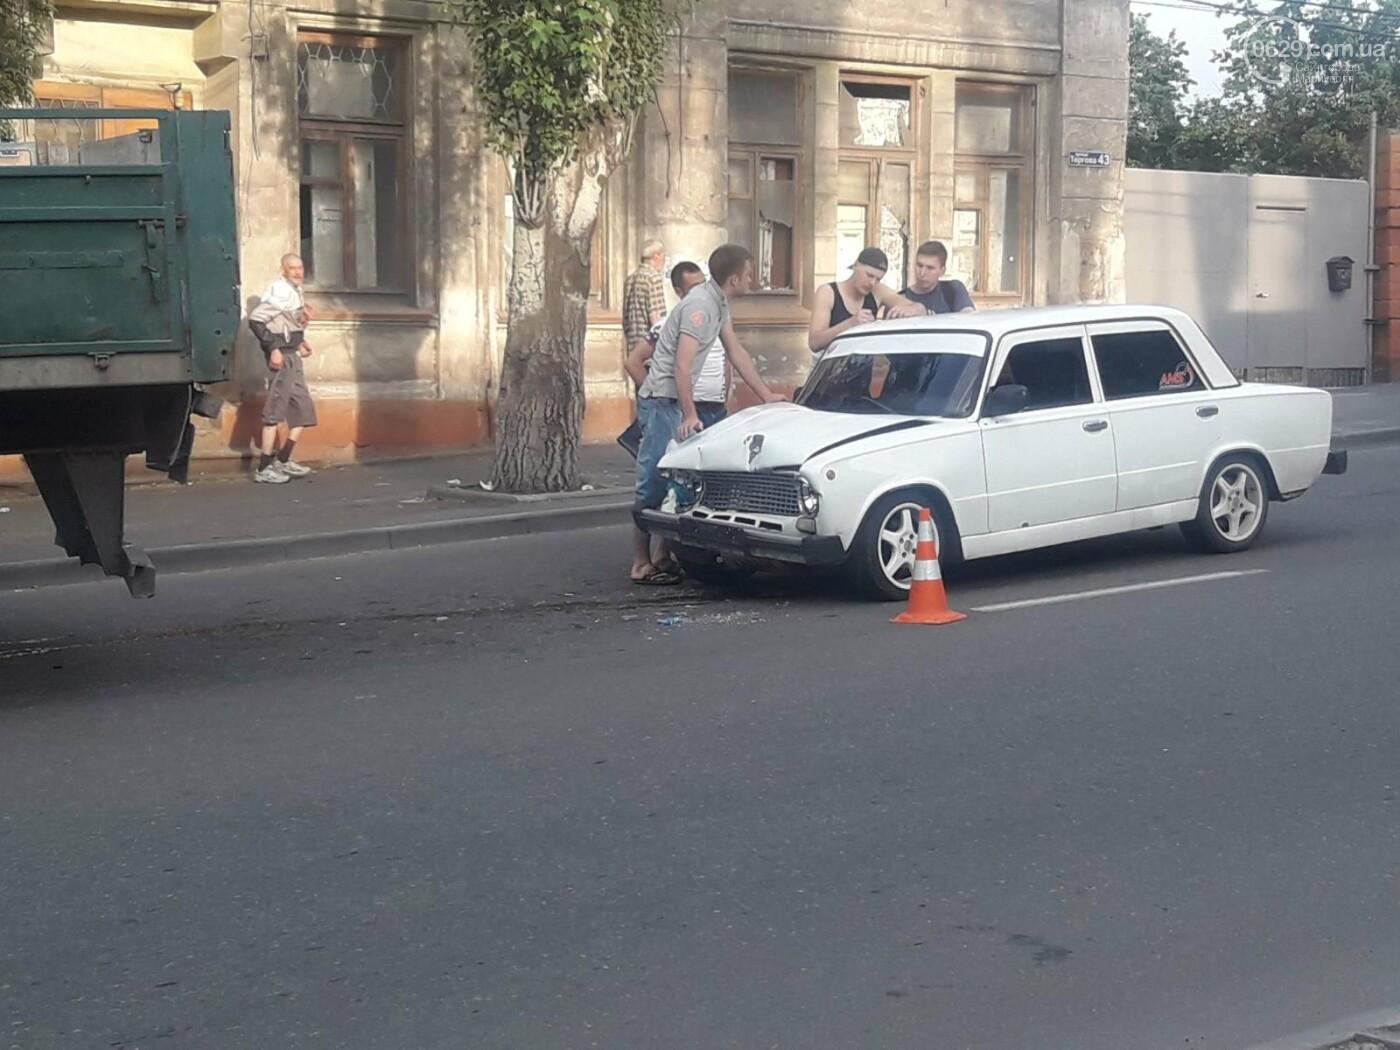 В Мариуполе «копейка» влетела в грузовик. Пострадала девушка, - ФОТО, фото-1